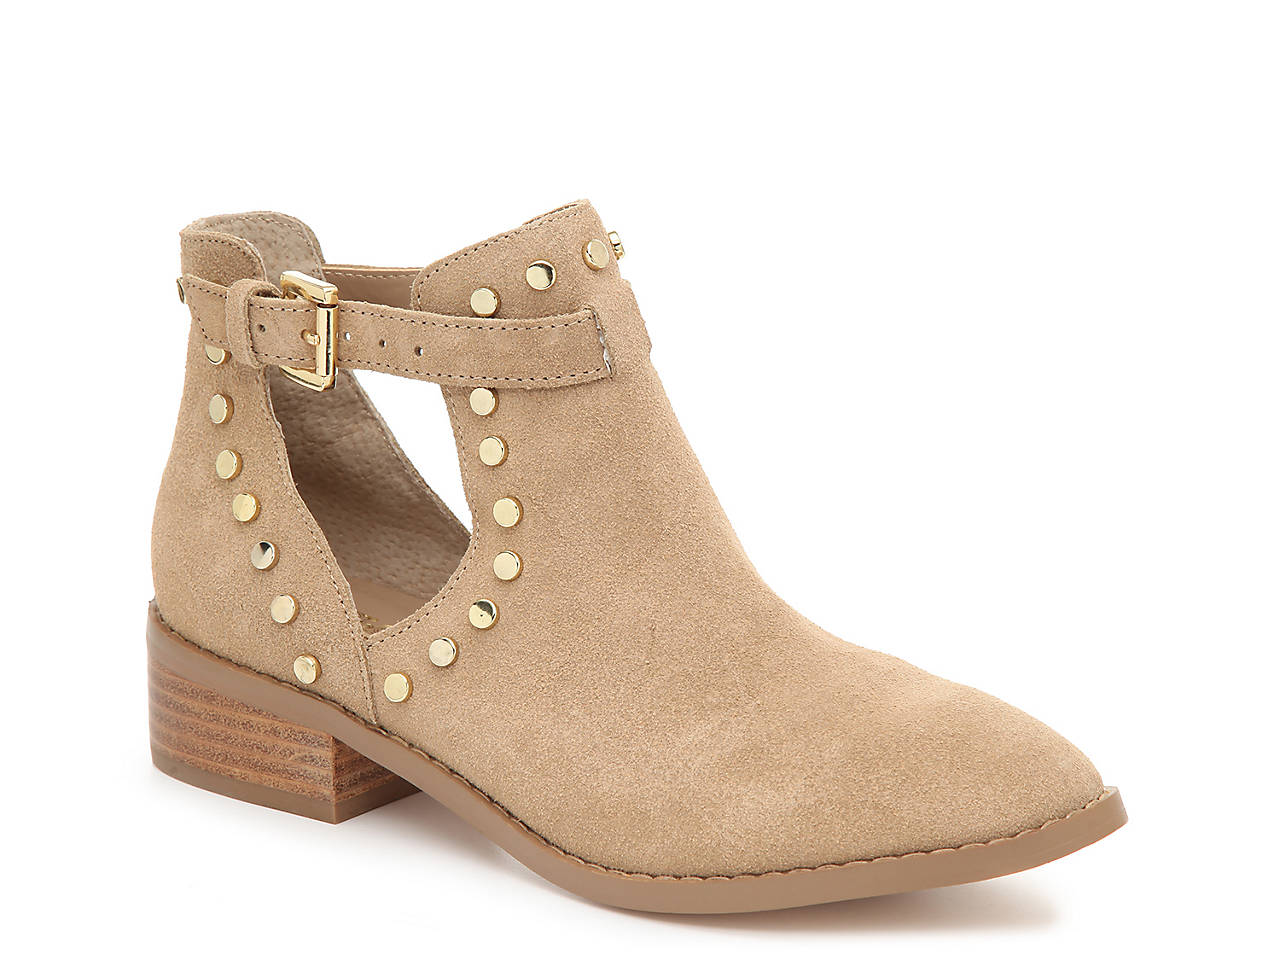 5c3c432b80d9 Carlos by Carlos Santana Blake Bootie Women s Shoes